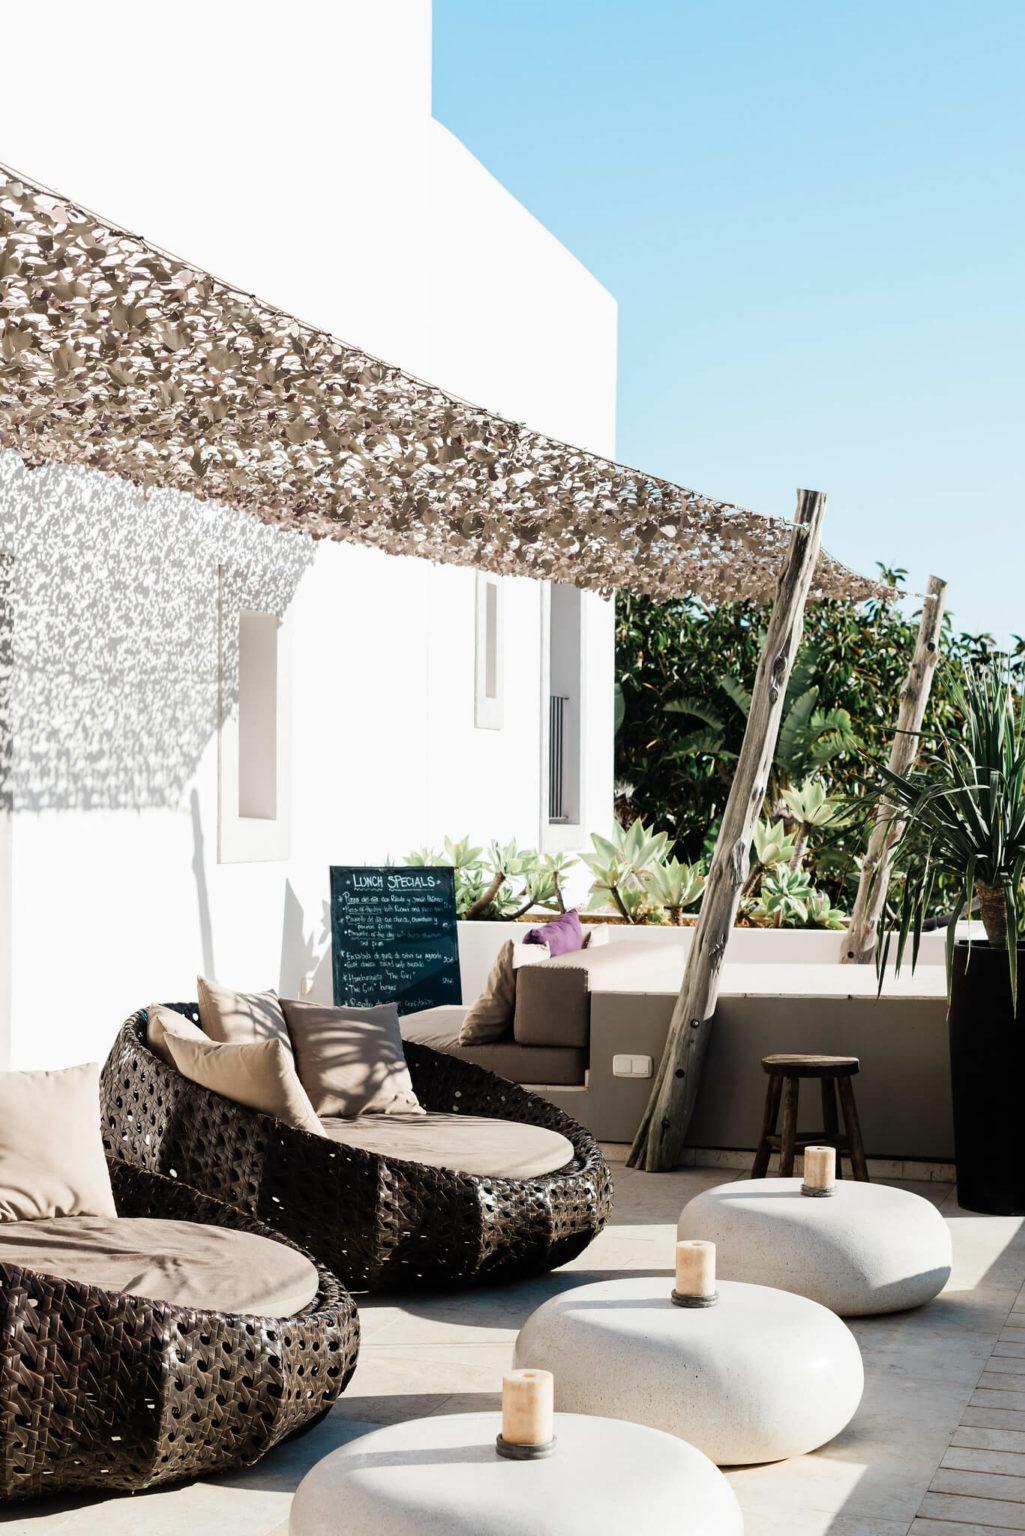 https://www.white-ibiza.com/wp-content/uploads/2020/03/white-ibiza-boutique-hotels-the-giri-residence-2020-02-1025x1536.jpg